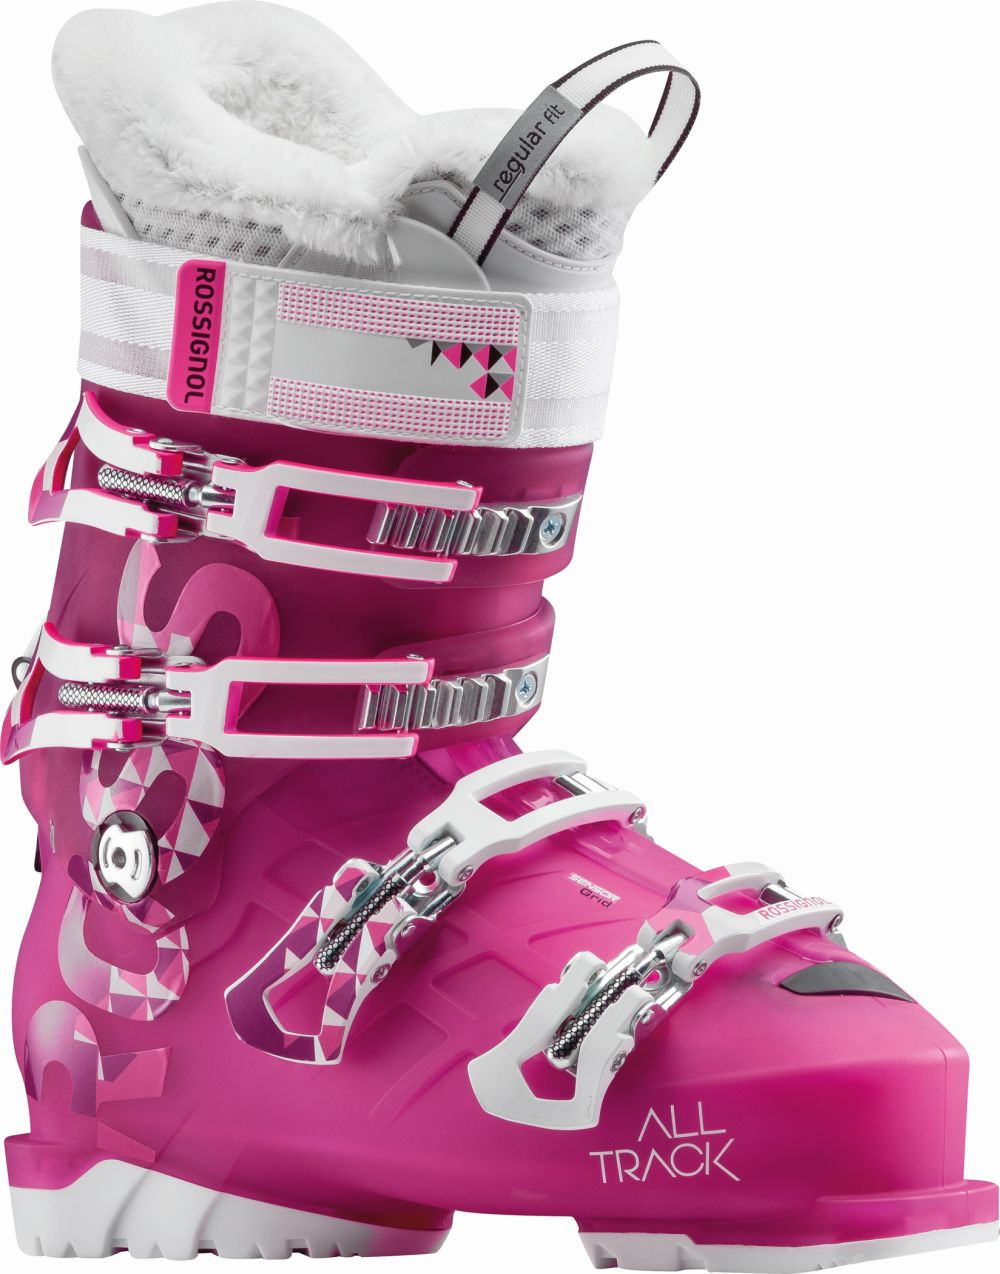 Rossignol eshop - Lyžiarky  Alltrack 70 W pink 4a6648c137a